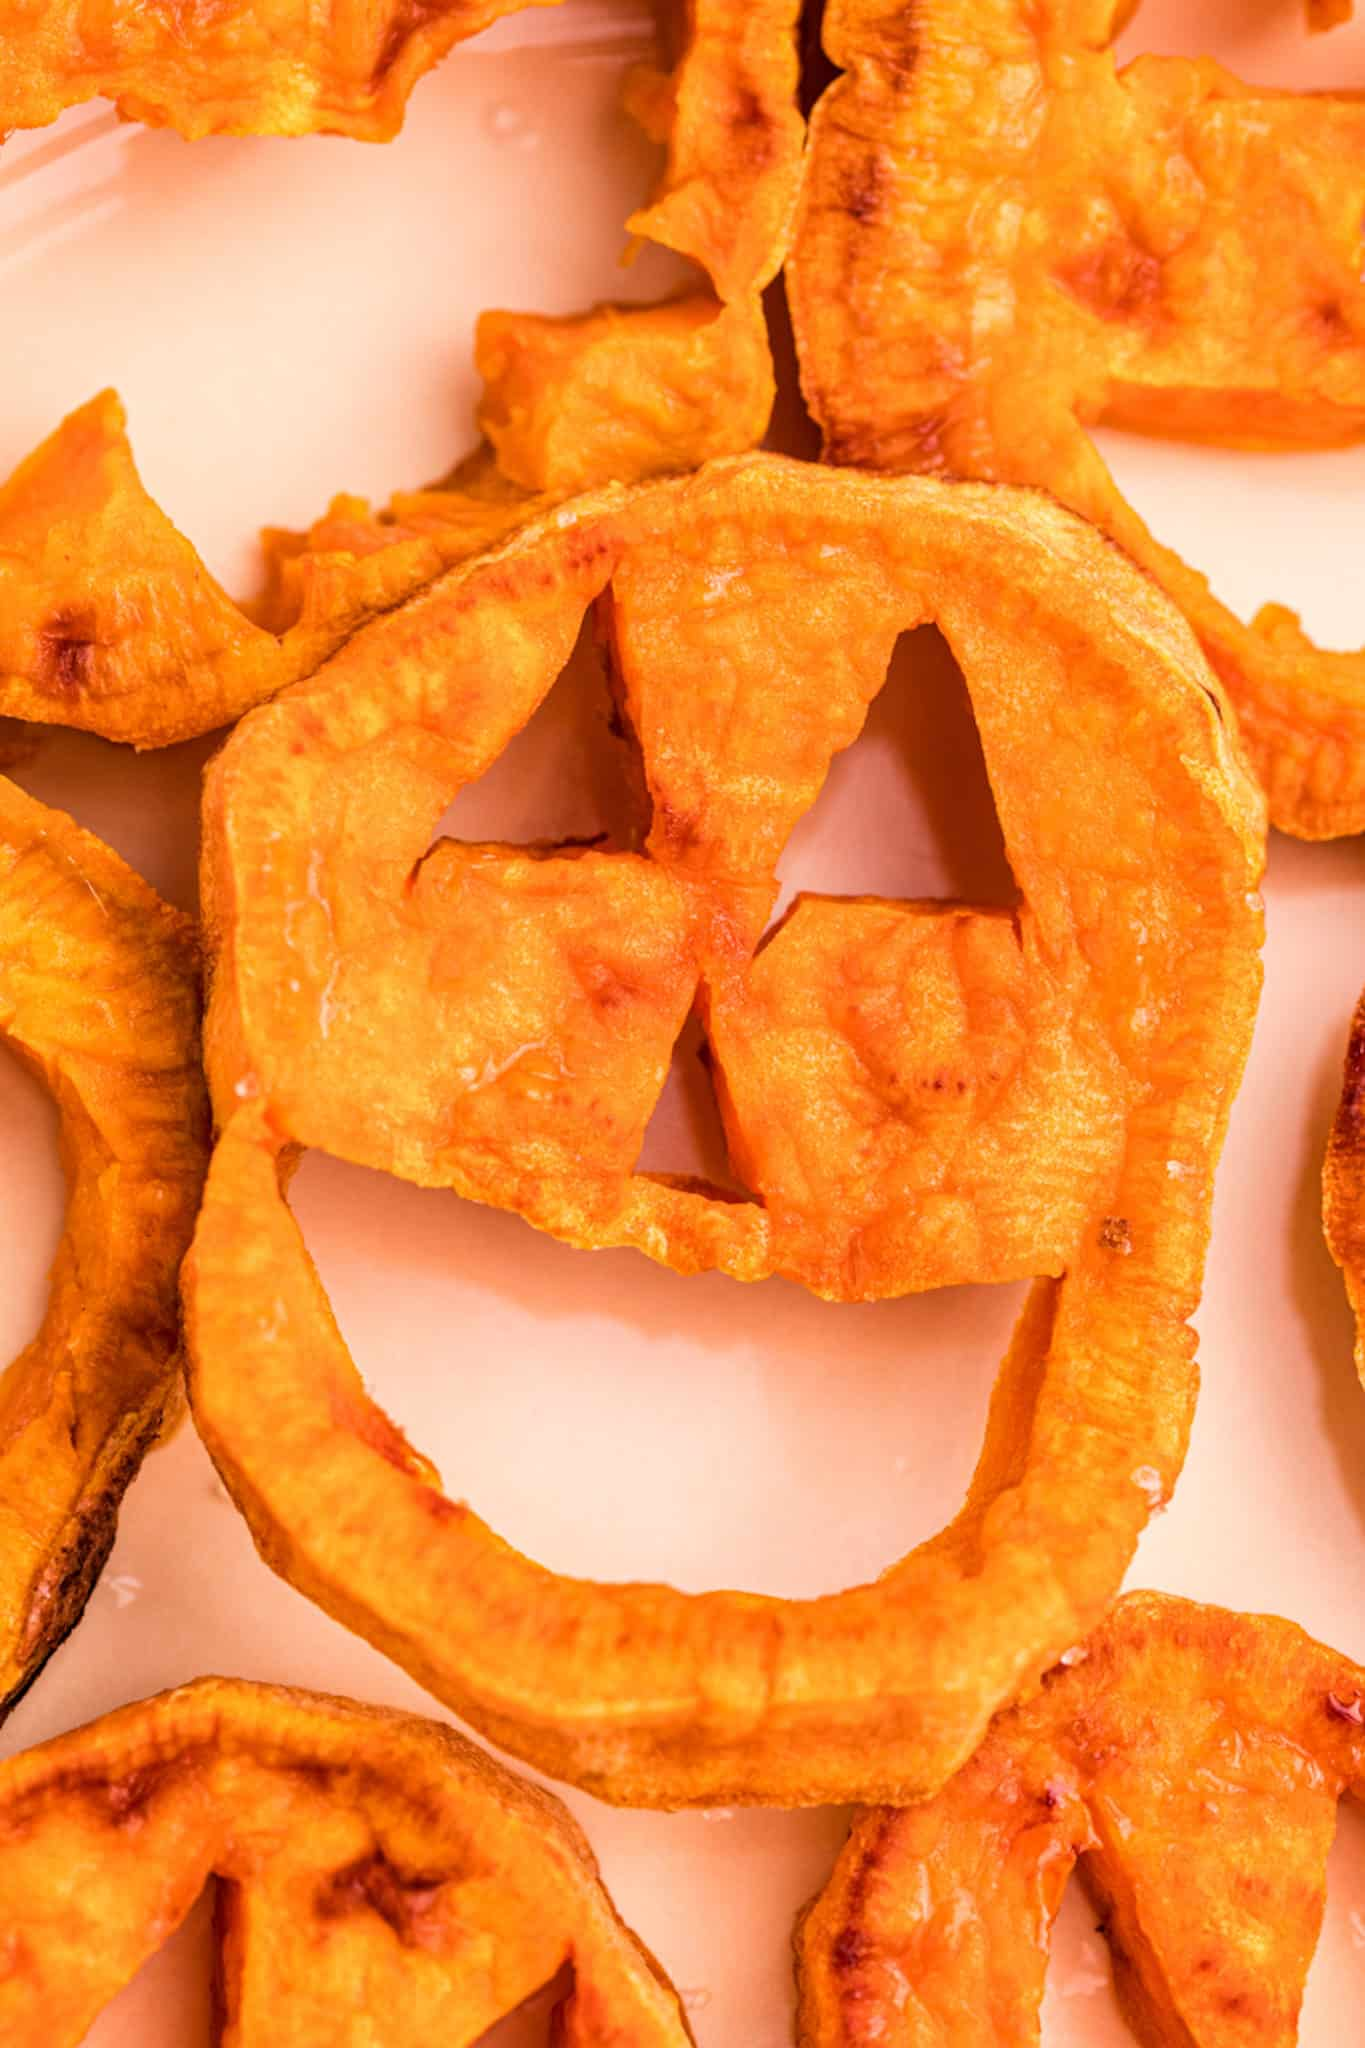 jack o lantern face cut into a slice of sweet potato